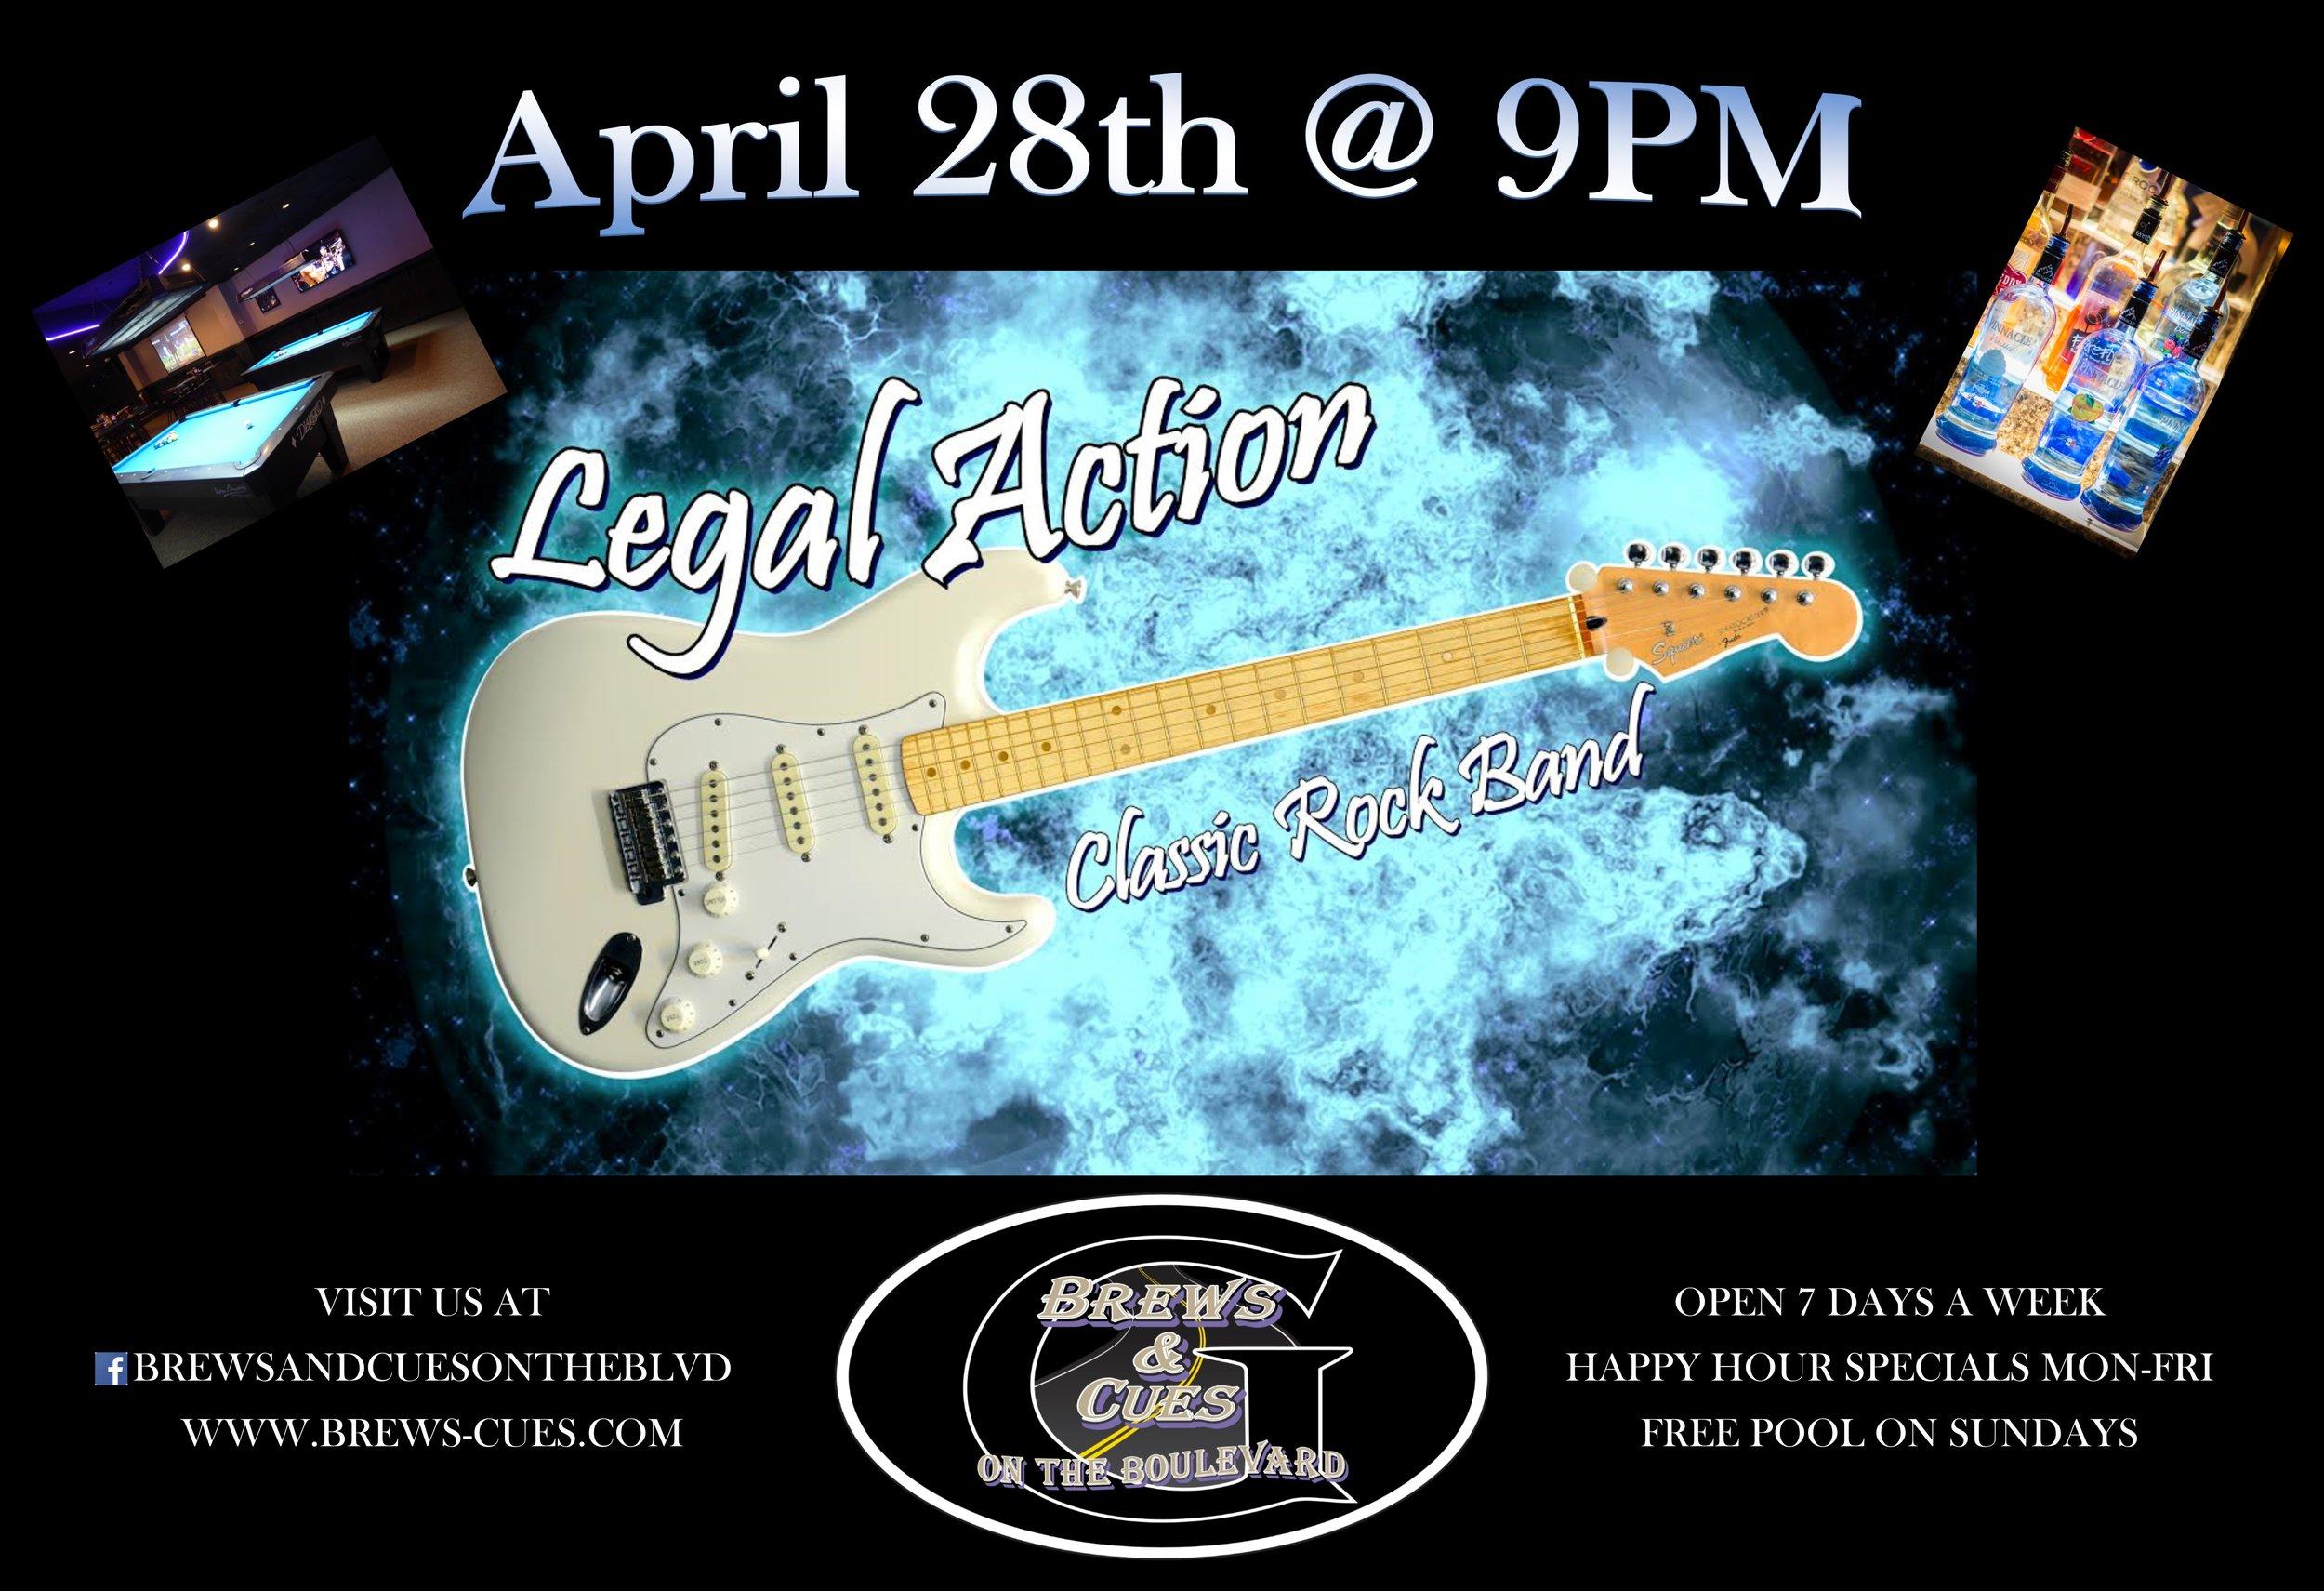 Legal Action April 28th.jpg